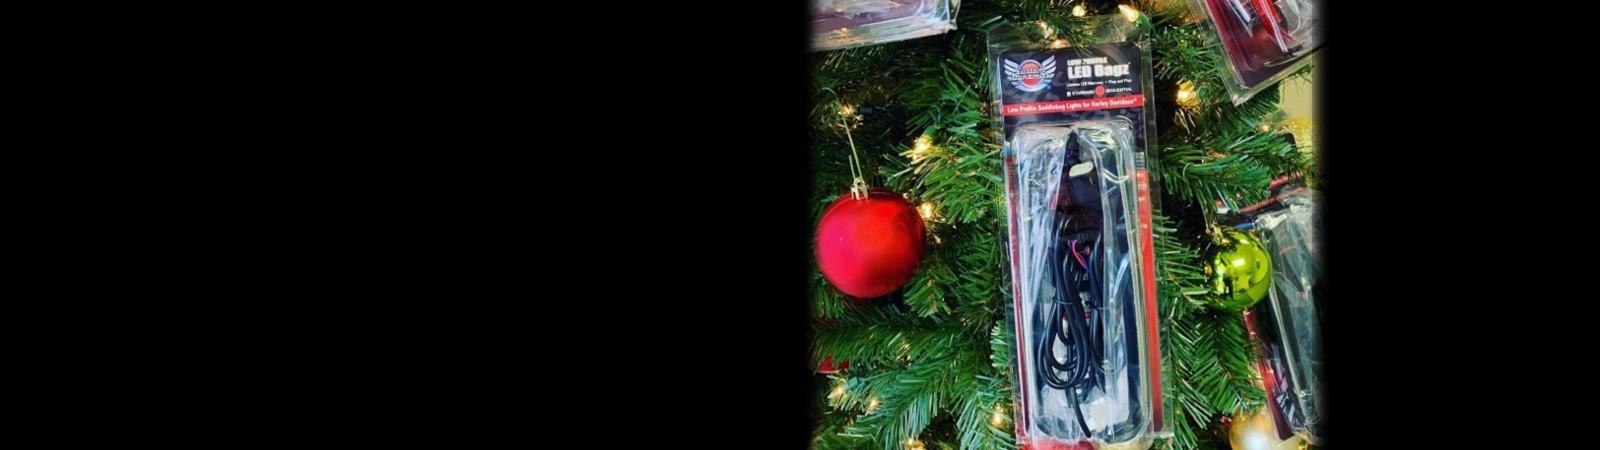 Custom Dynamics Motorcycle Christmas Gifts